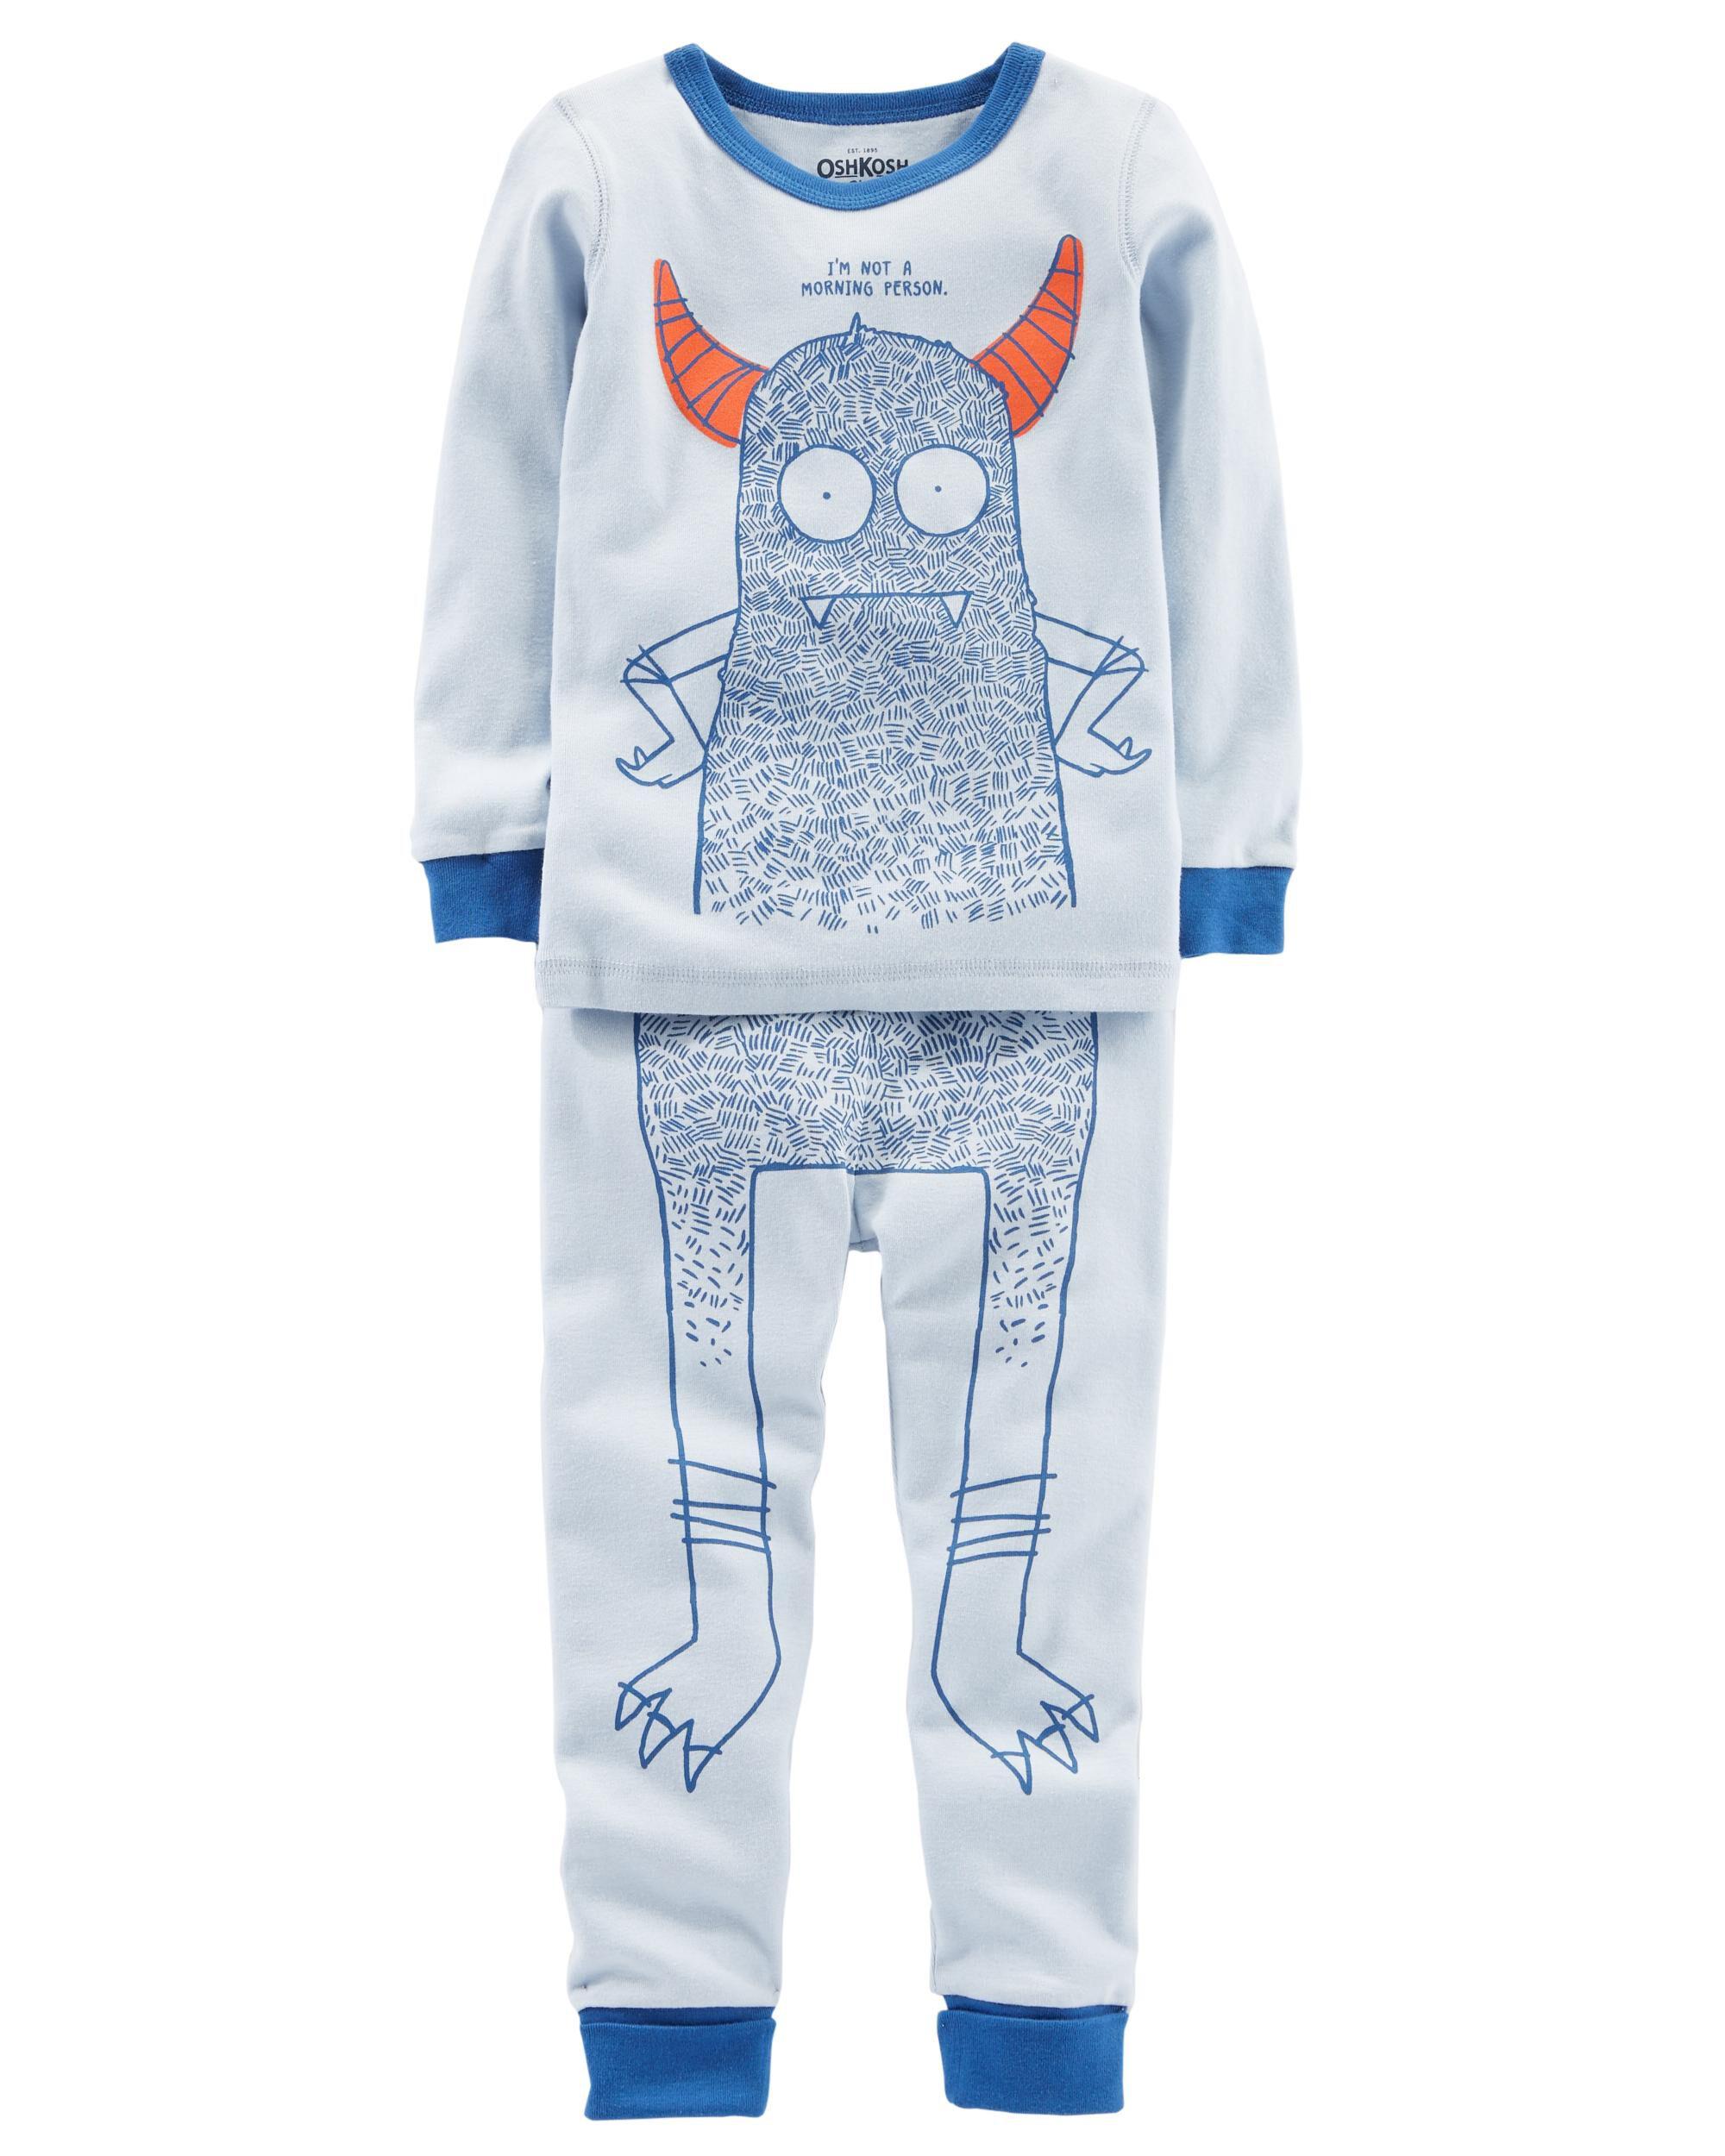 toddler boy pajamas sleepwear shipping 2 piece snug fit cotton pjs